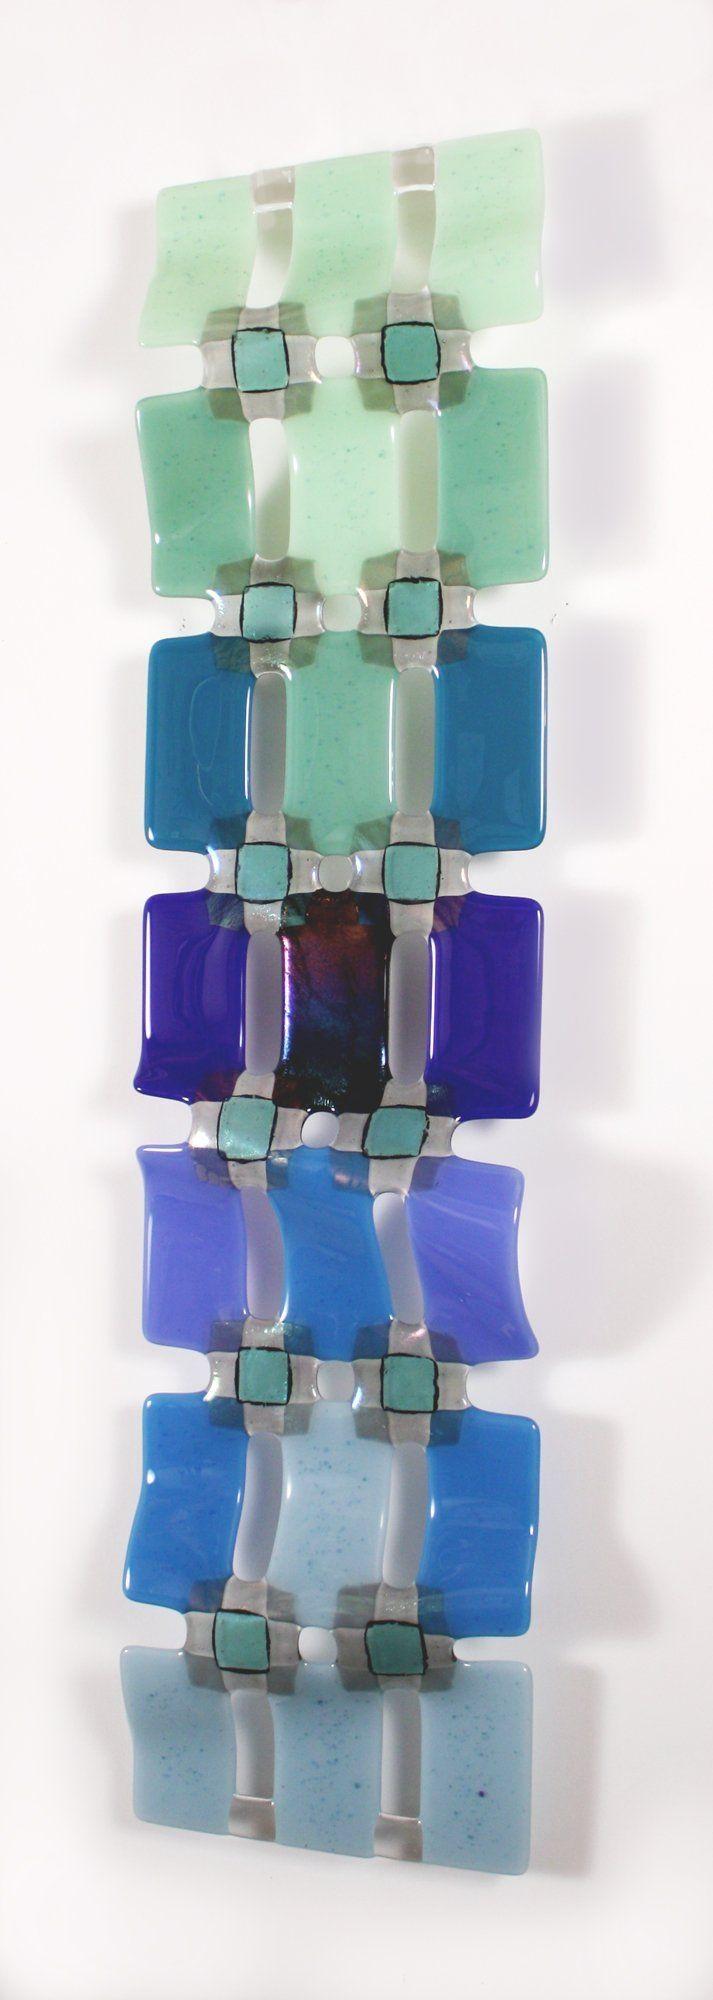 398 Best Glass: Art Pieces Images On Pinterest | Fused Glass throughout Fused Glass Wall Art Panels